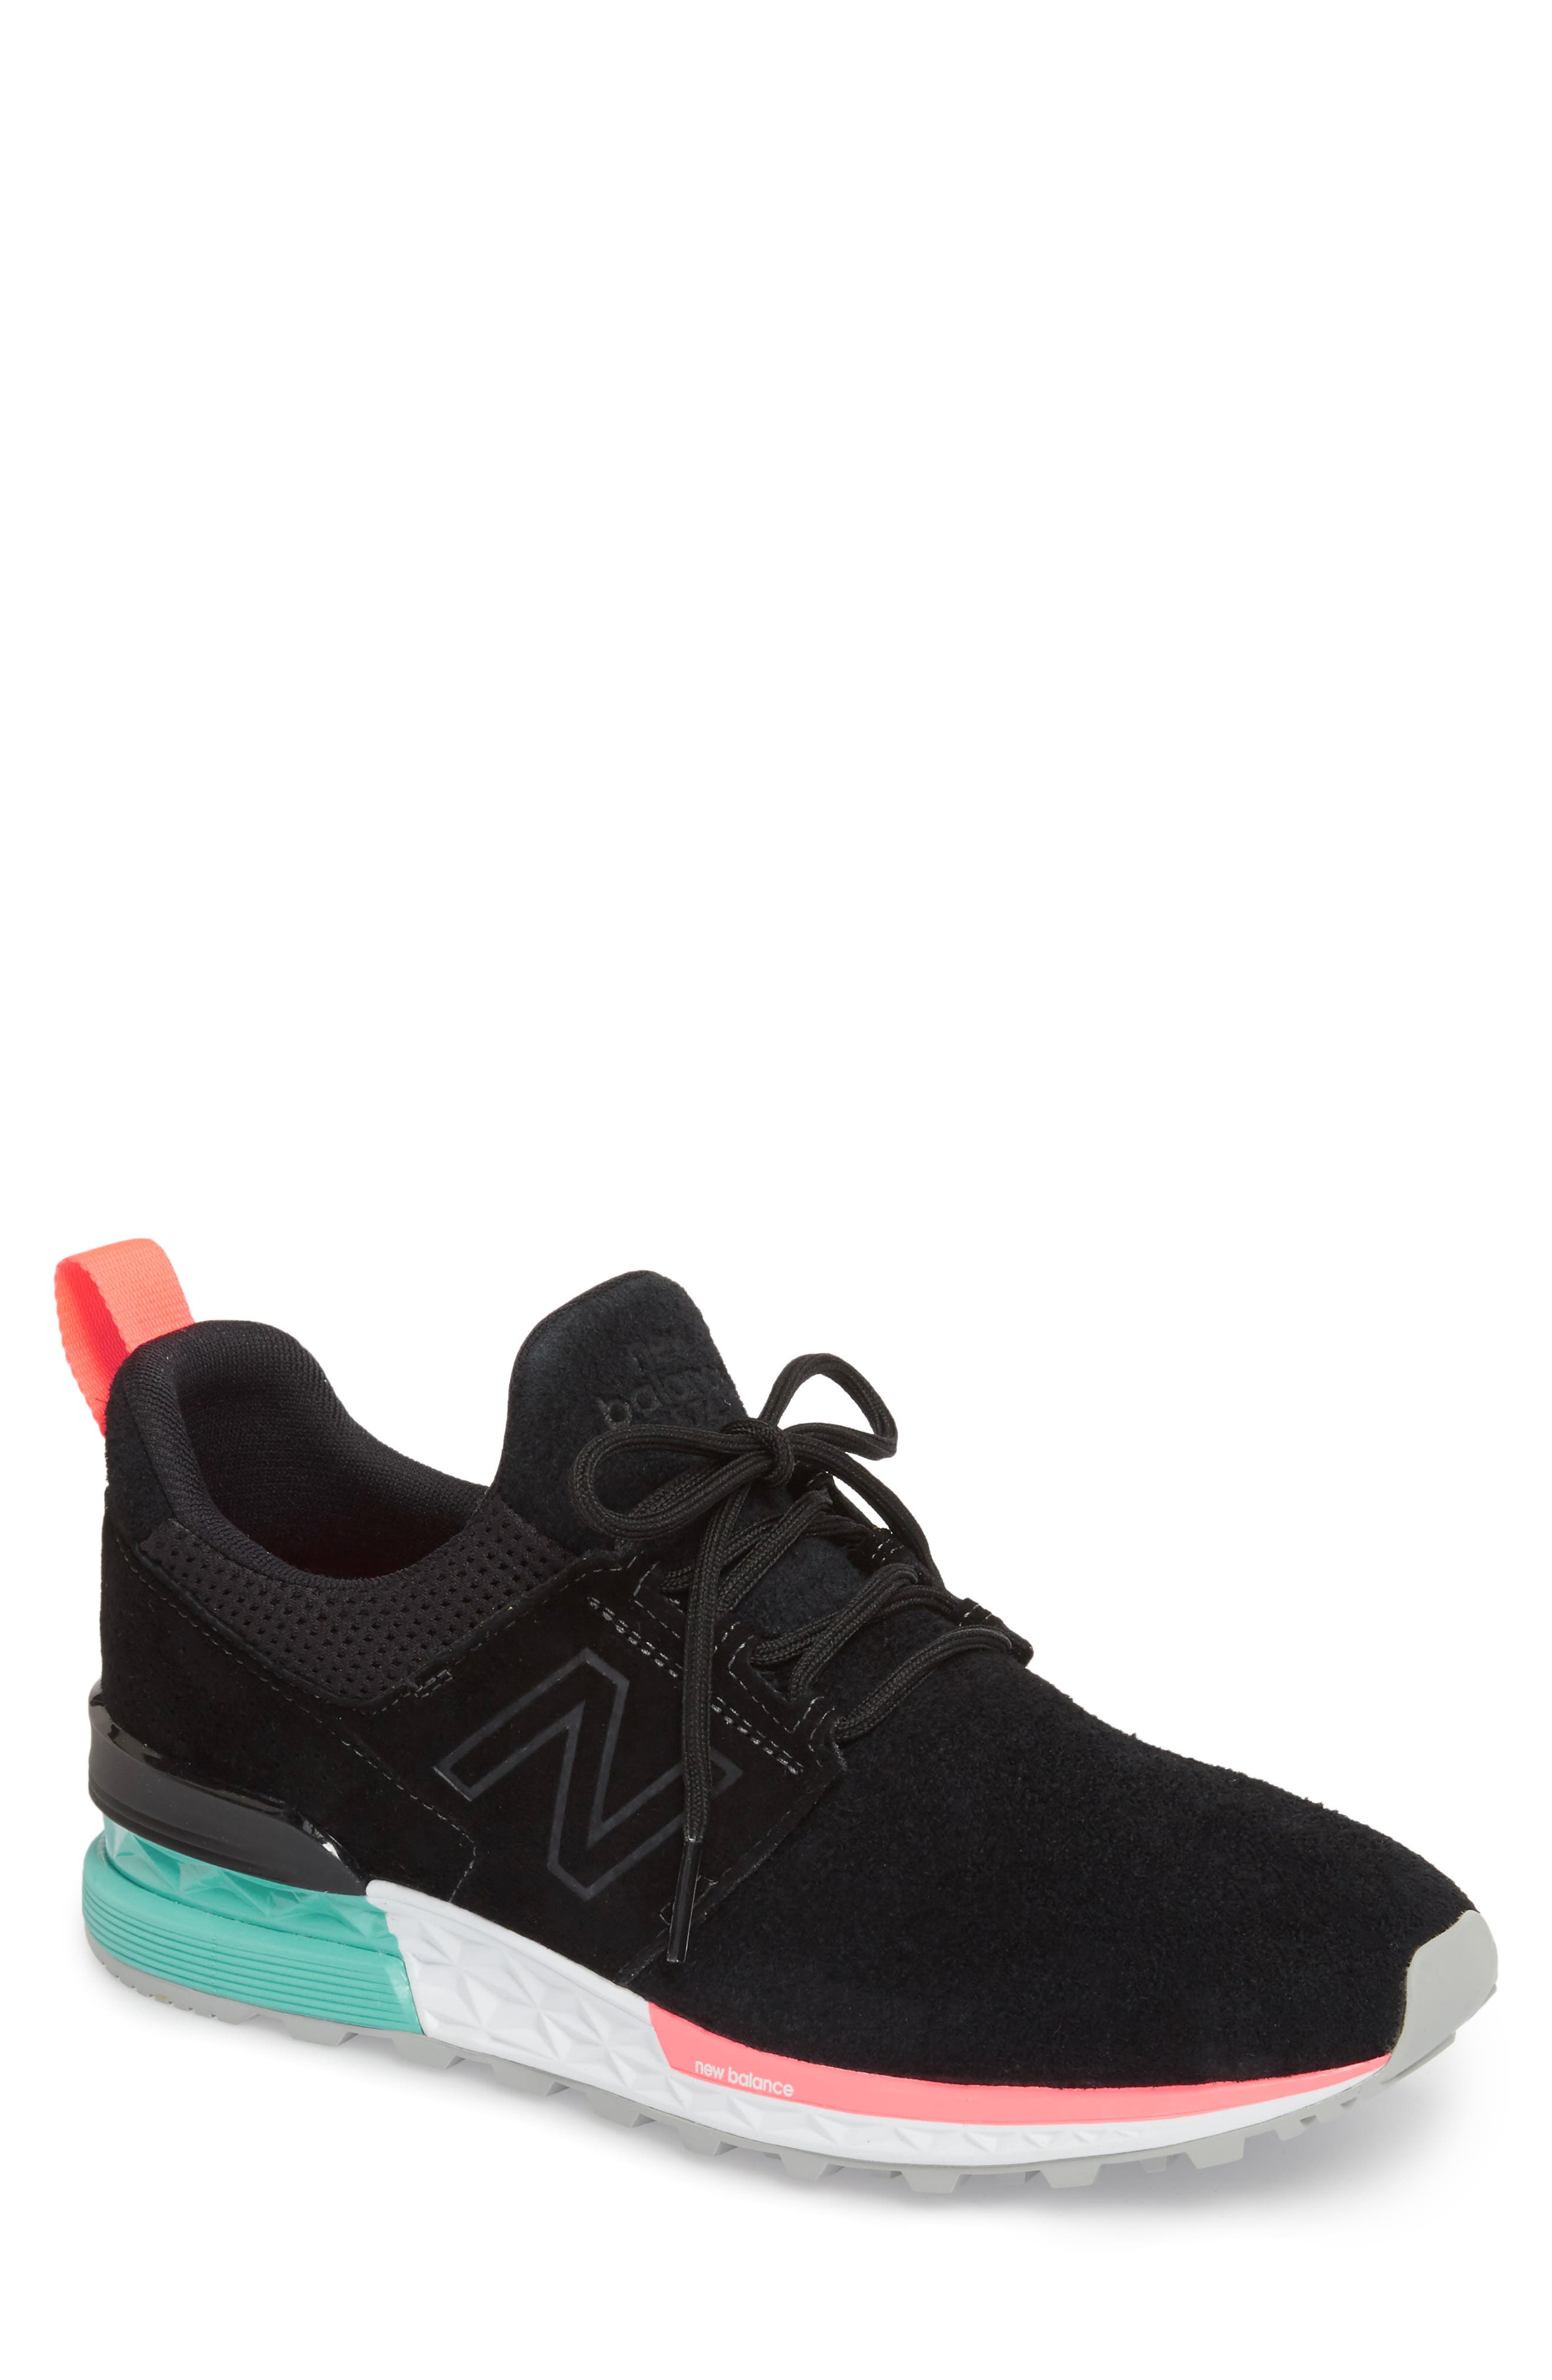 New Balance 574 Sport Sneaker (Men)